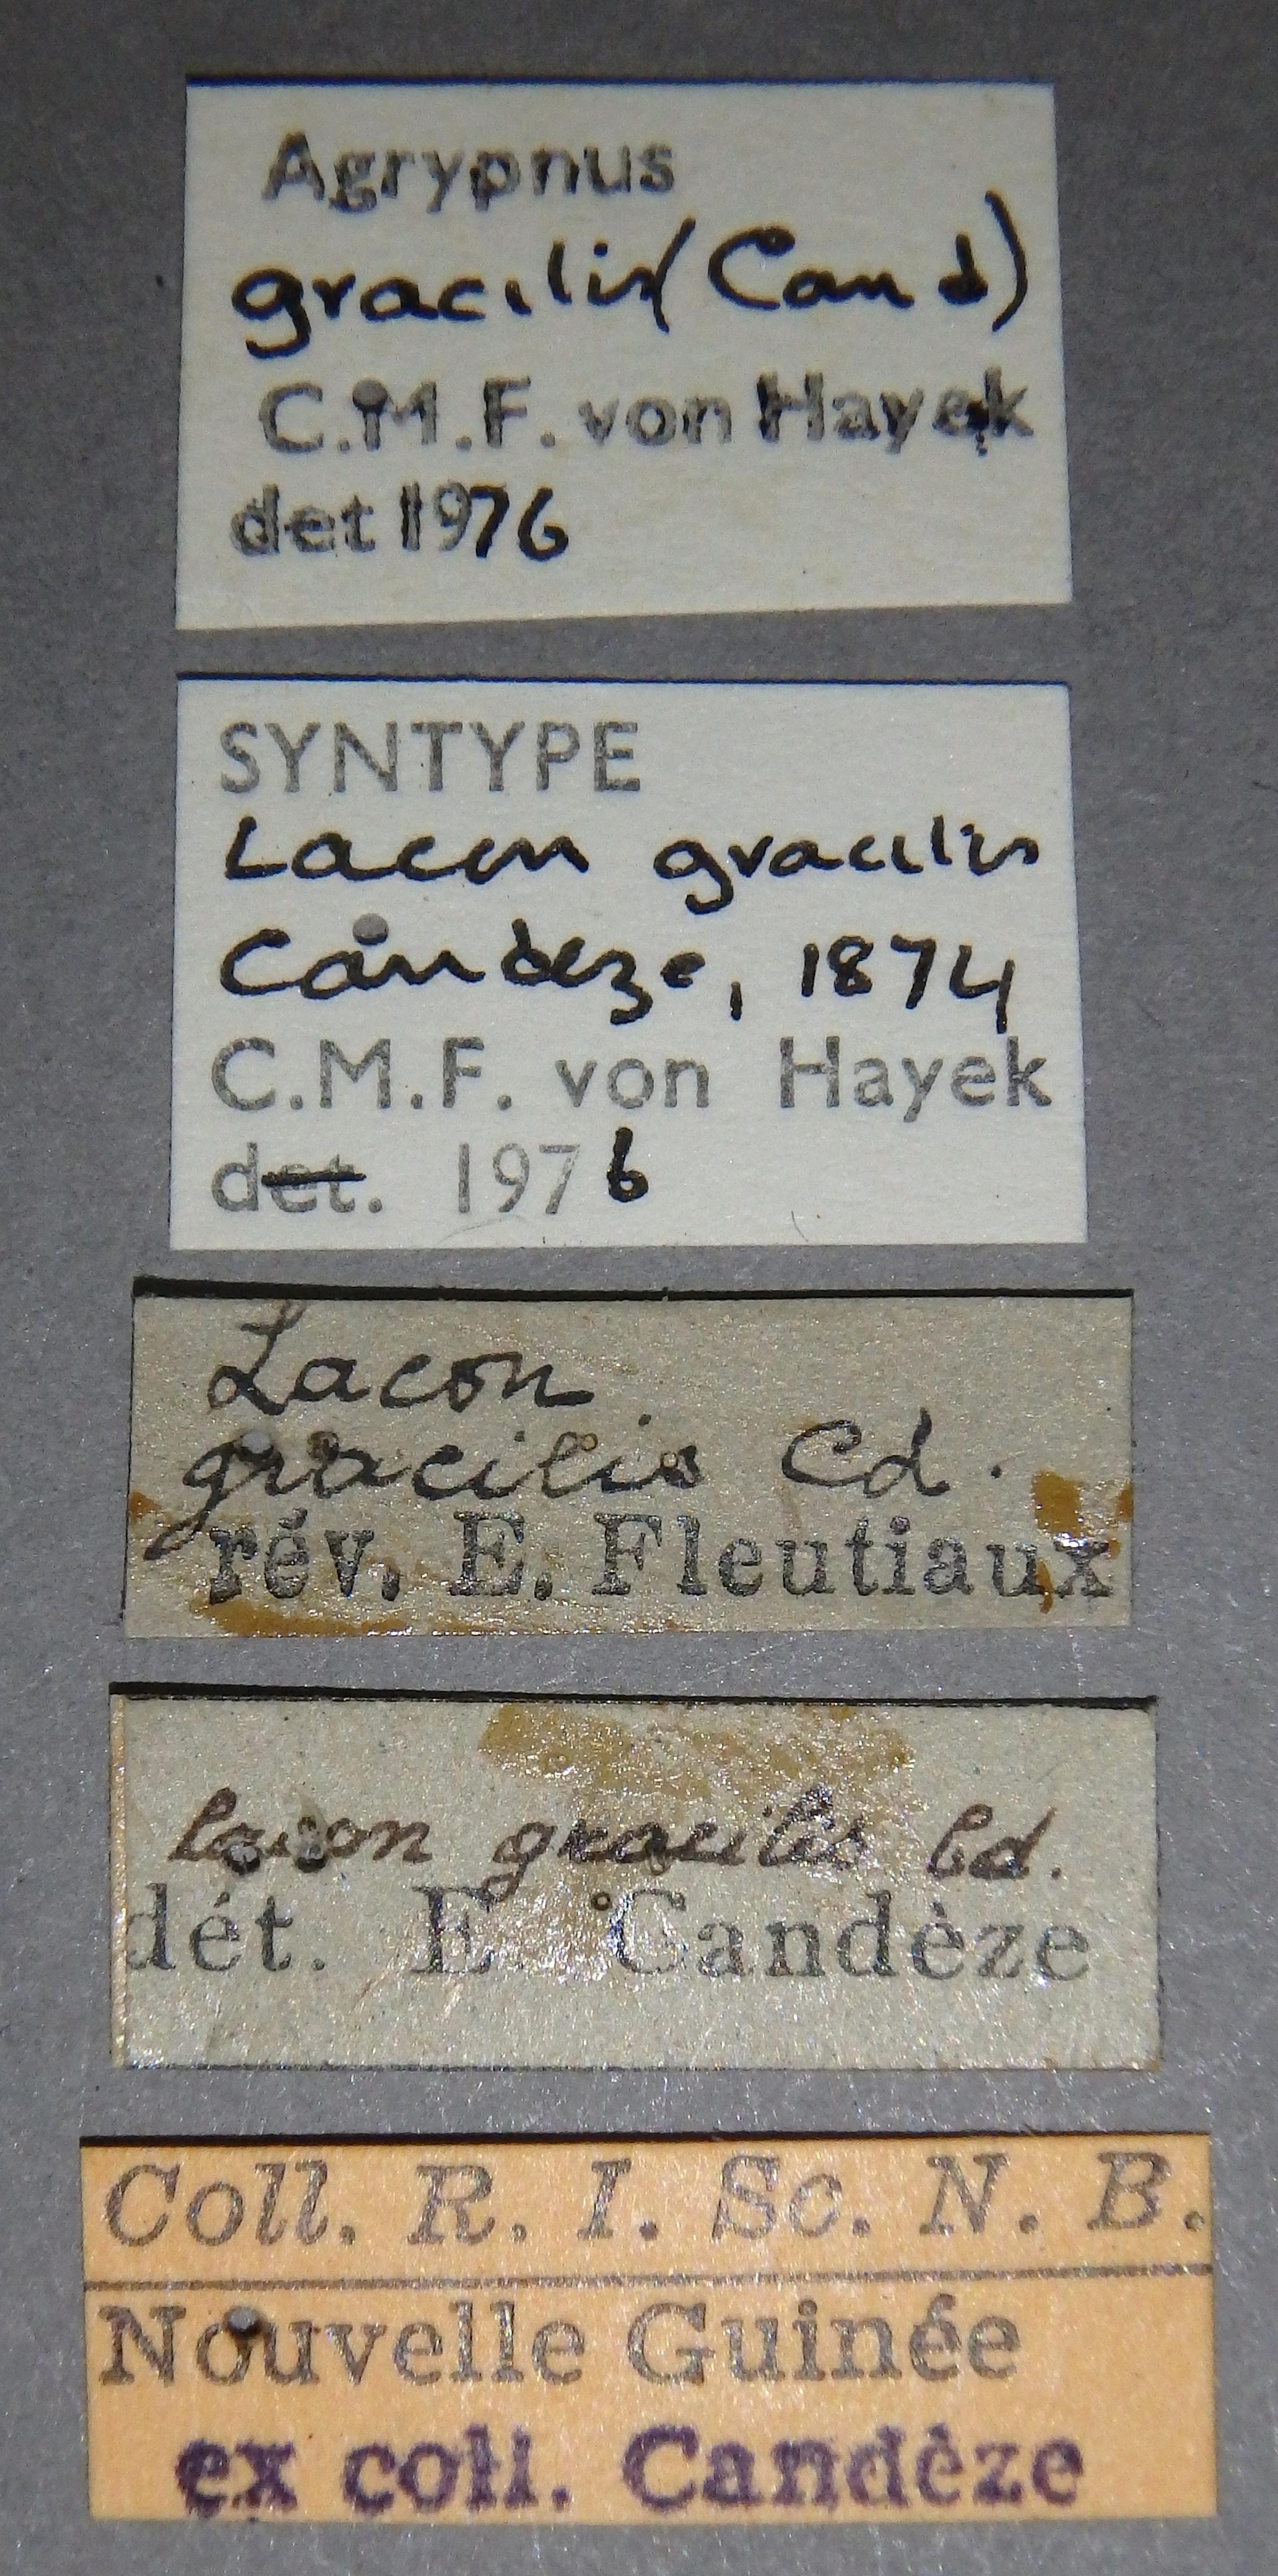 Lacon gracilis st04 Lb.JPG